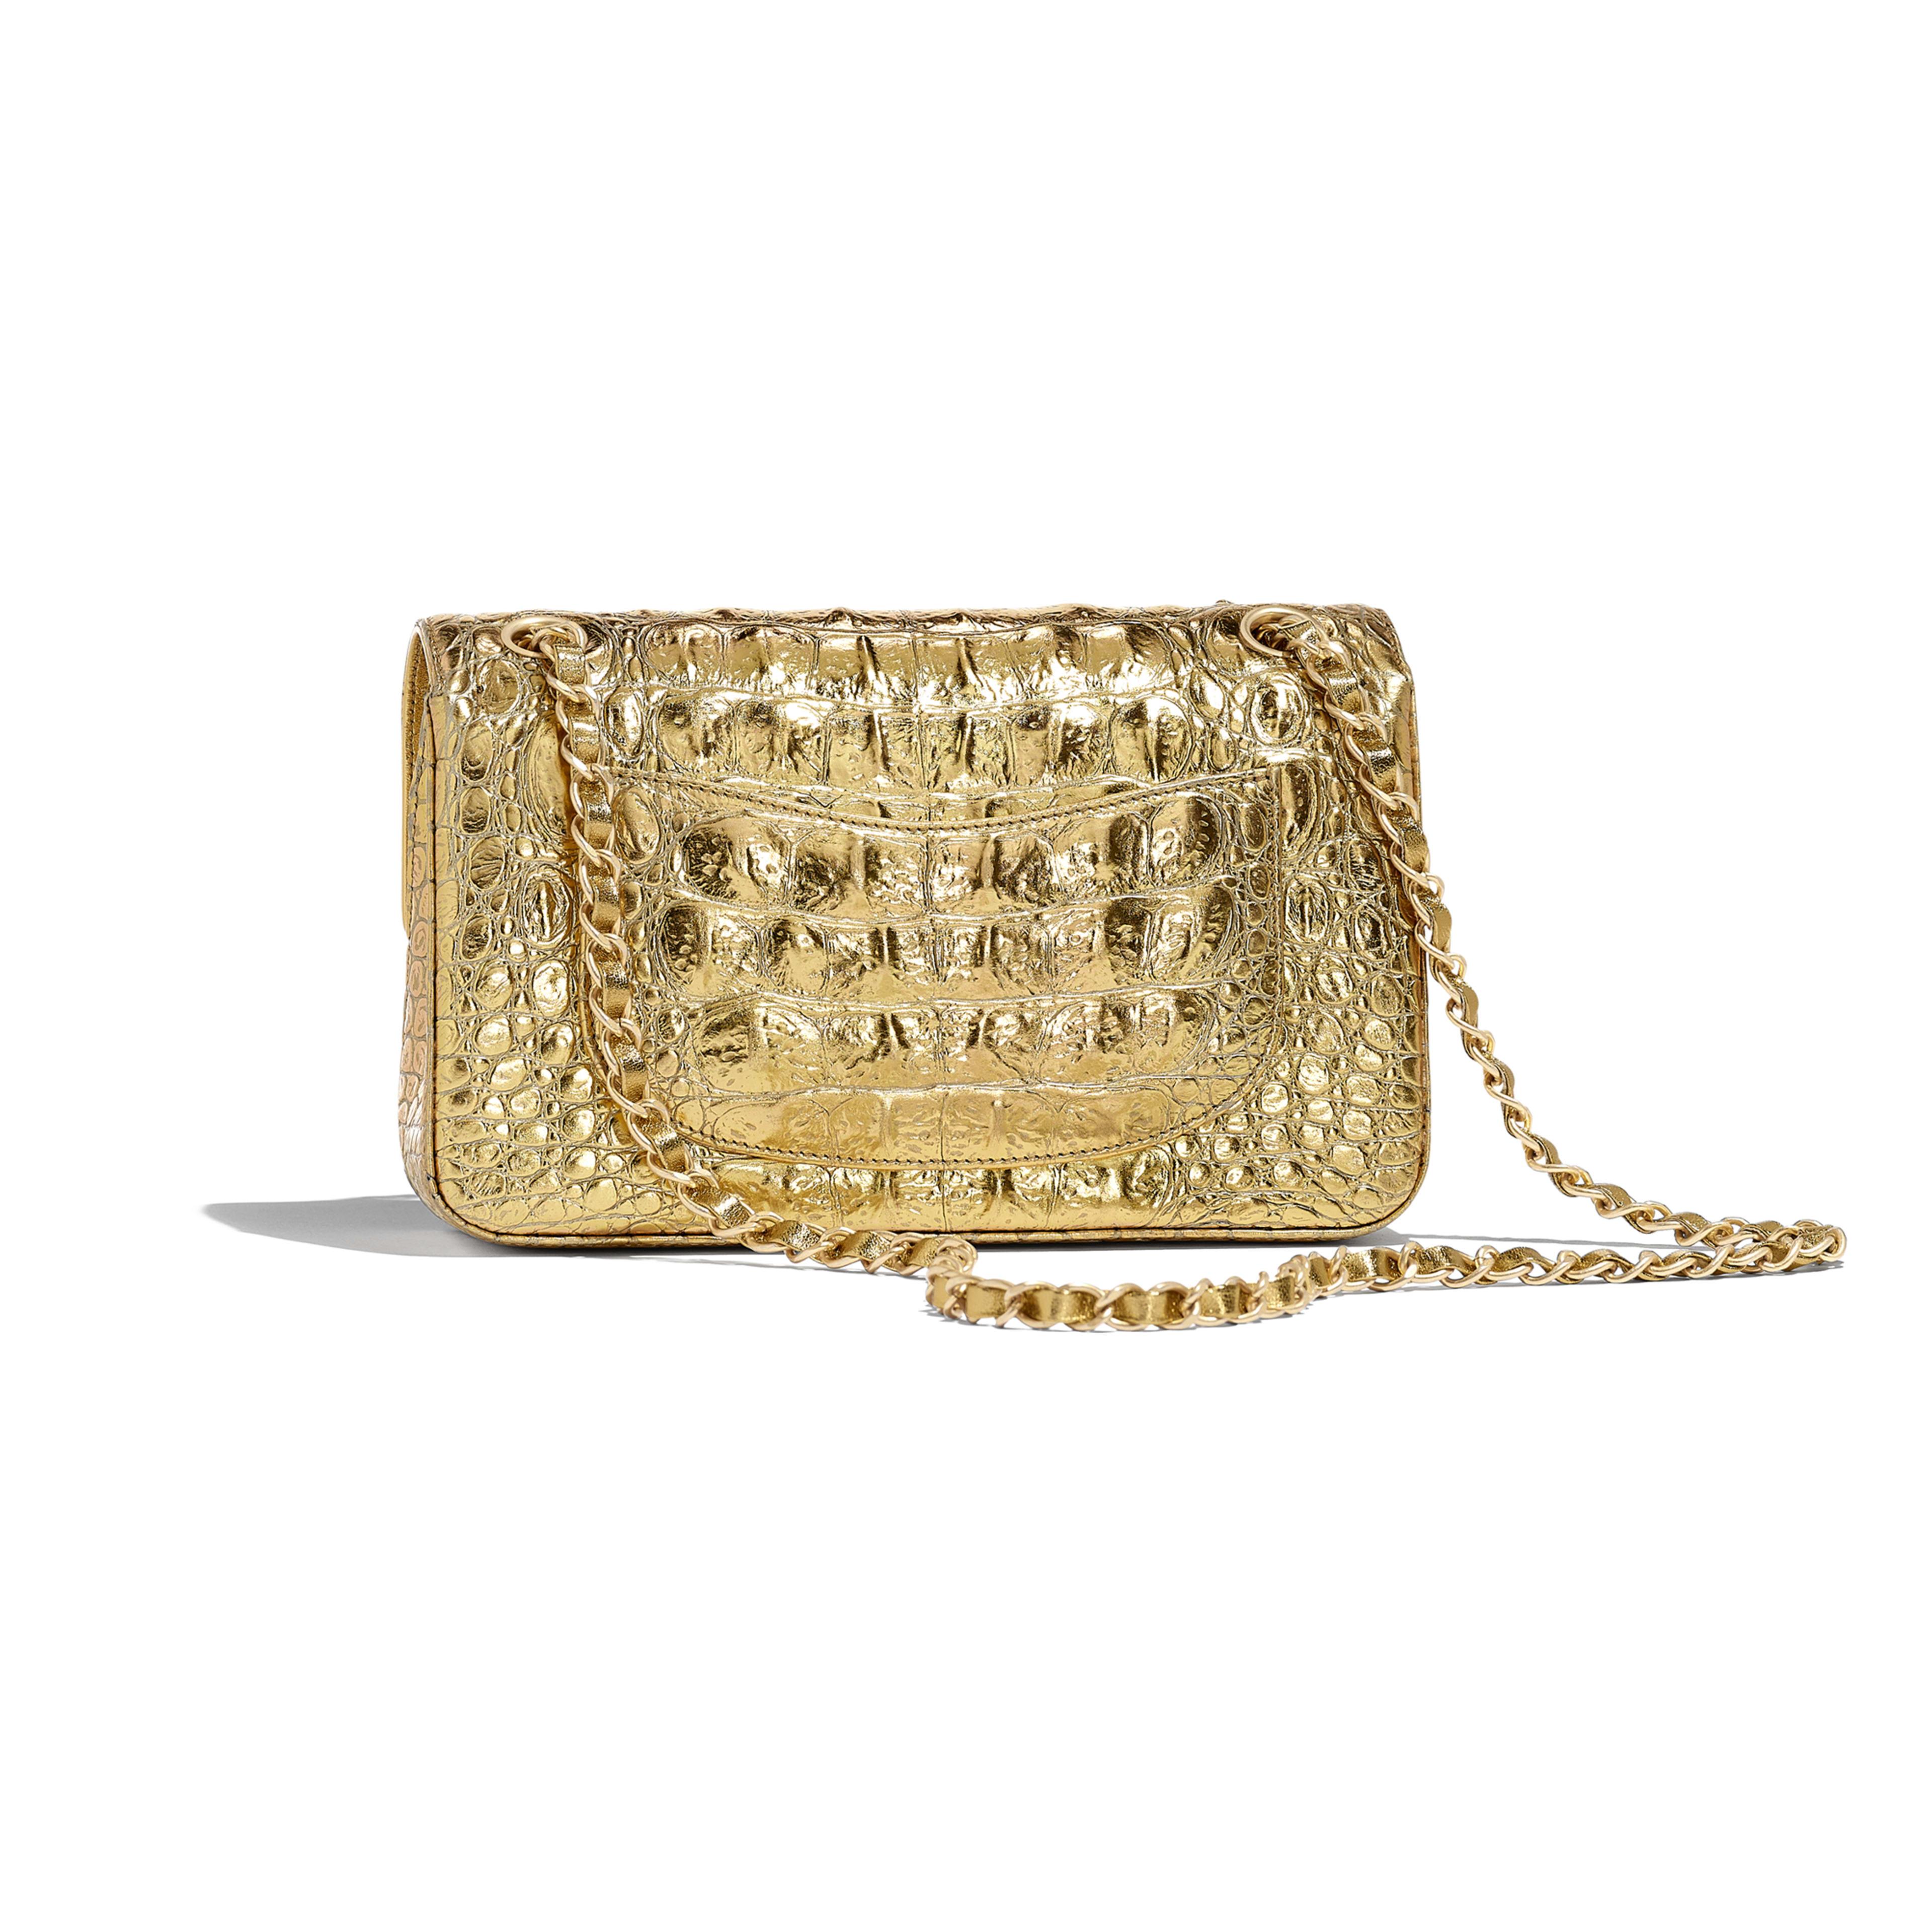 Small Classic Handbag - Gold - Metallic Crocodile Embossed Calfskin & Gold Metal - Alternative view - see full sized version